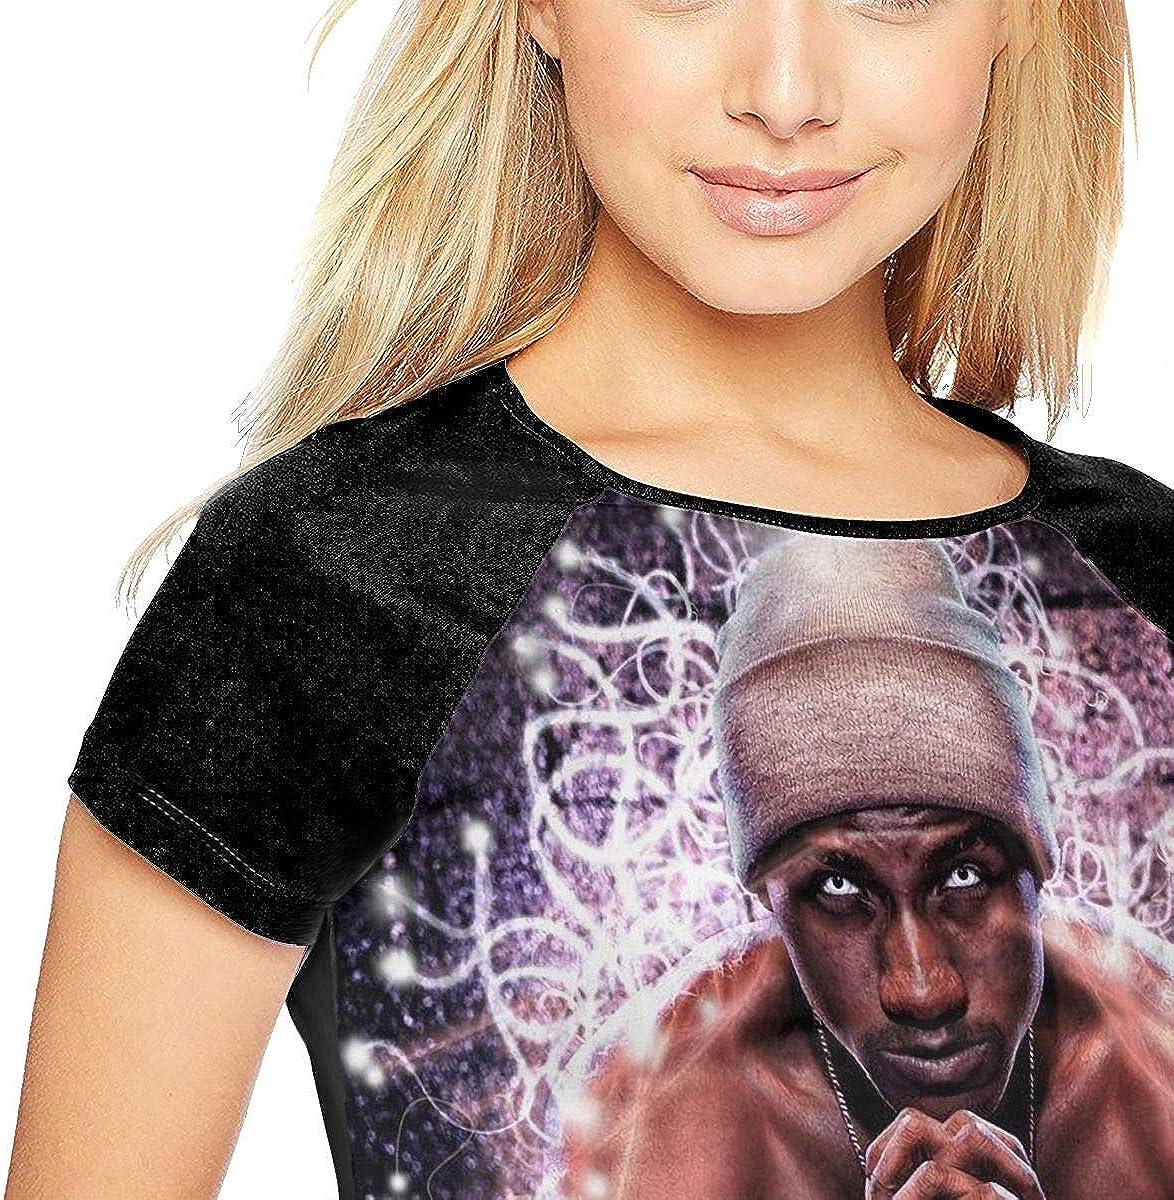 DaihAnle Hopsin Womens Individuality Fashion Baseball Short Sleeve Round Neck Print T-Shirt